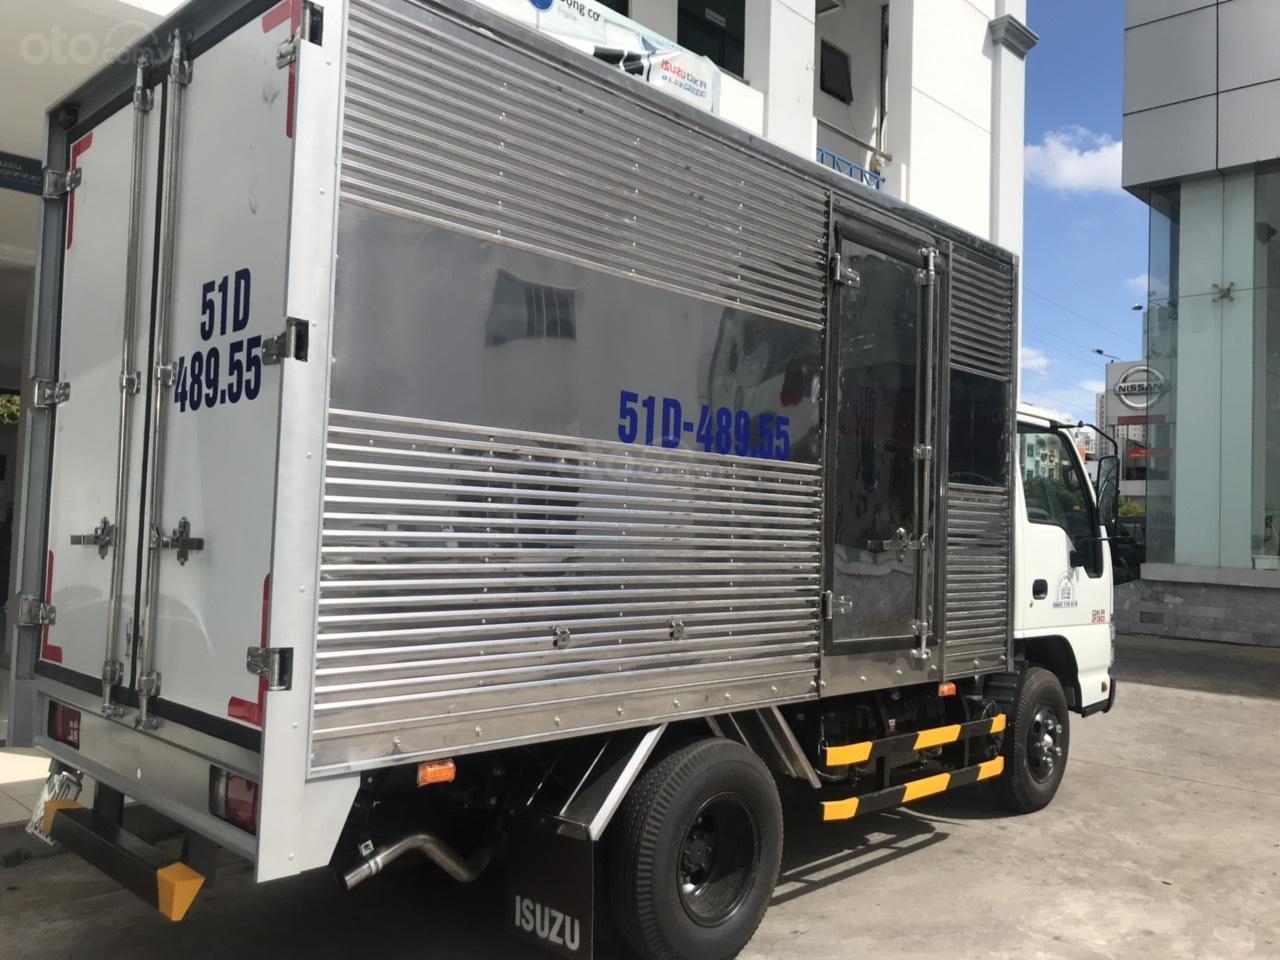 Bán xe tải Isuzu 2019 giá tốt nhất (3)